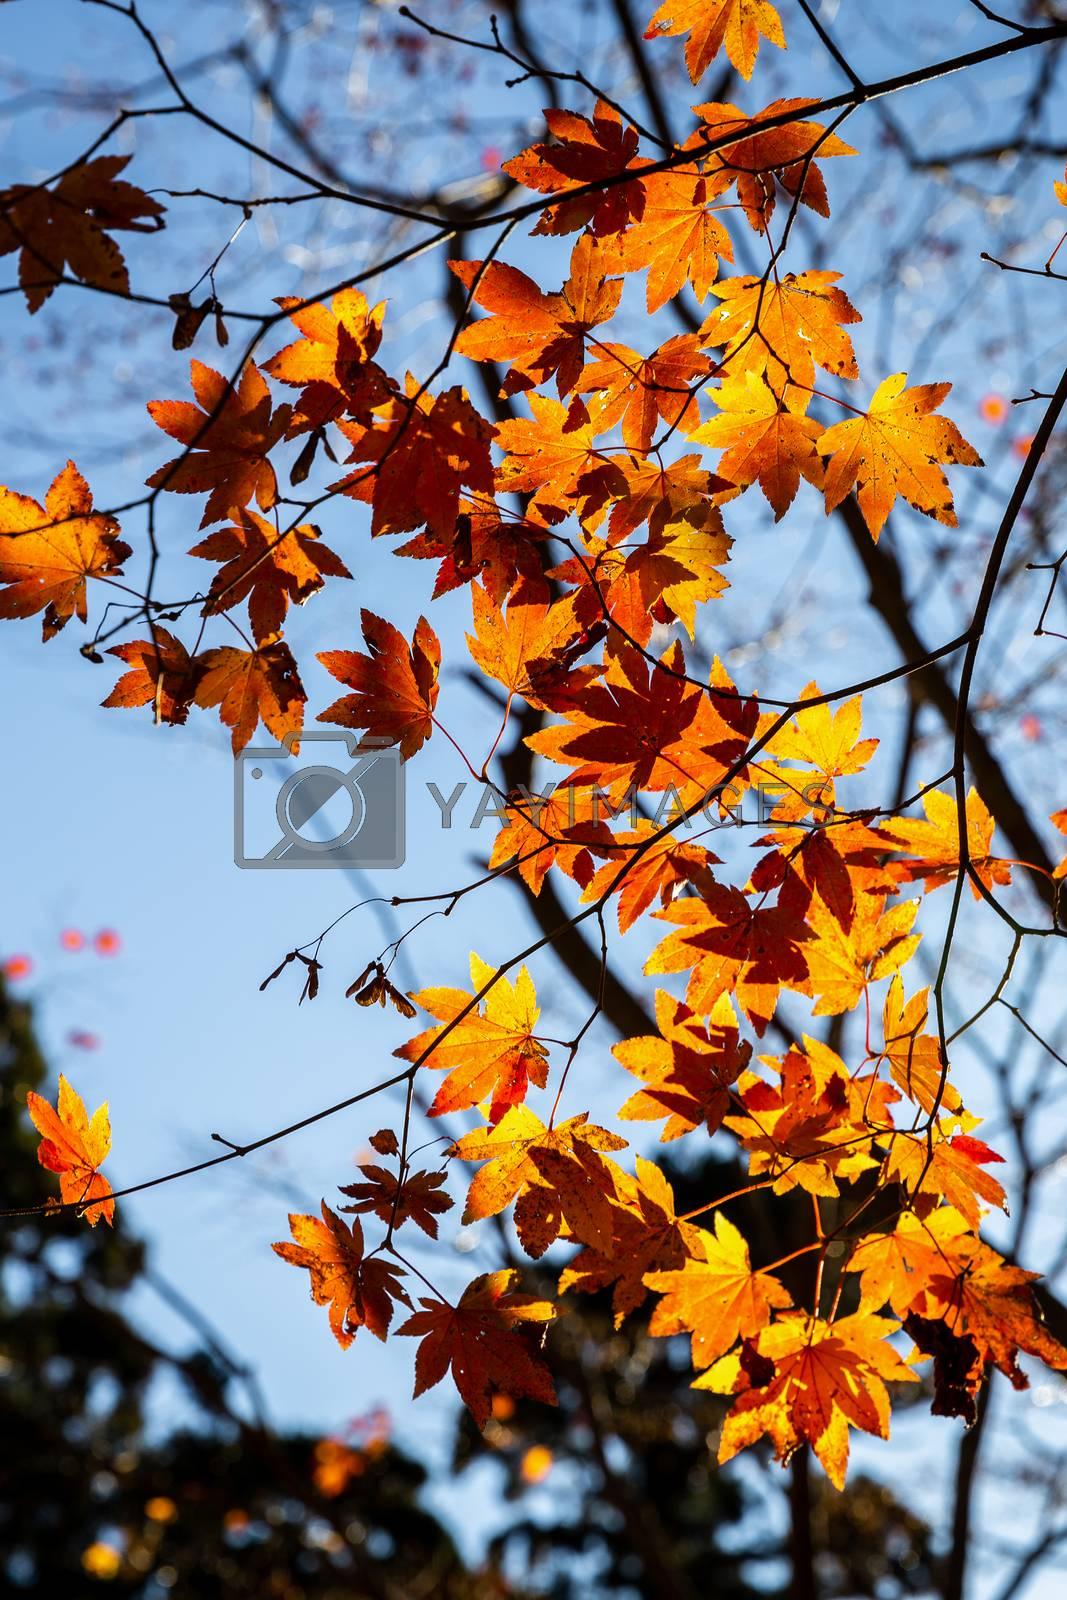 Yellow maple leaves touching sunlight before sunset during autumn at Mount Koyasan, Wakayama, Kansai, Japan.